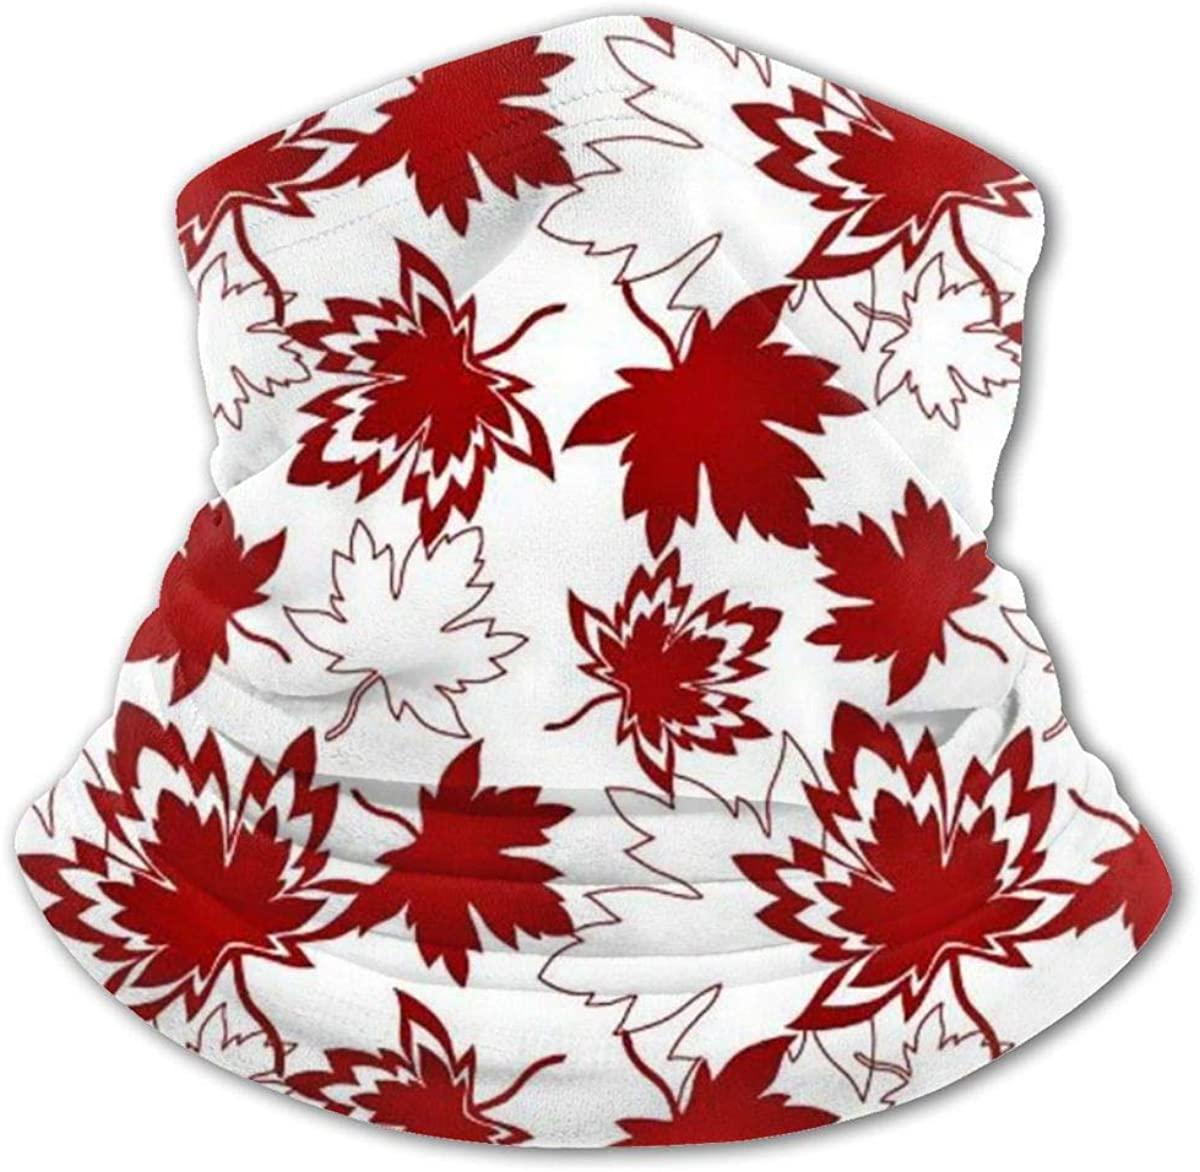 Canada Maple Headwear For Girls And Boys, Head Wrap, Neck Gaiter, Headband, Tenn Fishing Mask, Magic Scarf, Tube Mask, Face Bandana Mask For Camping Running Cycling